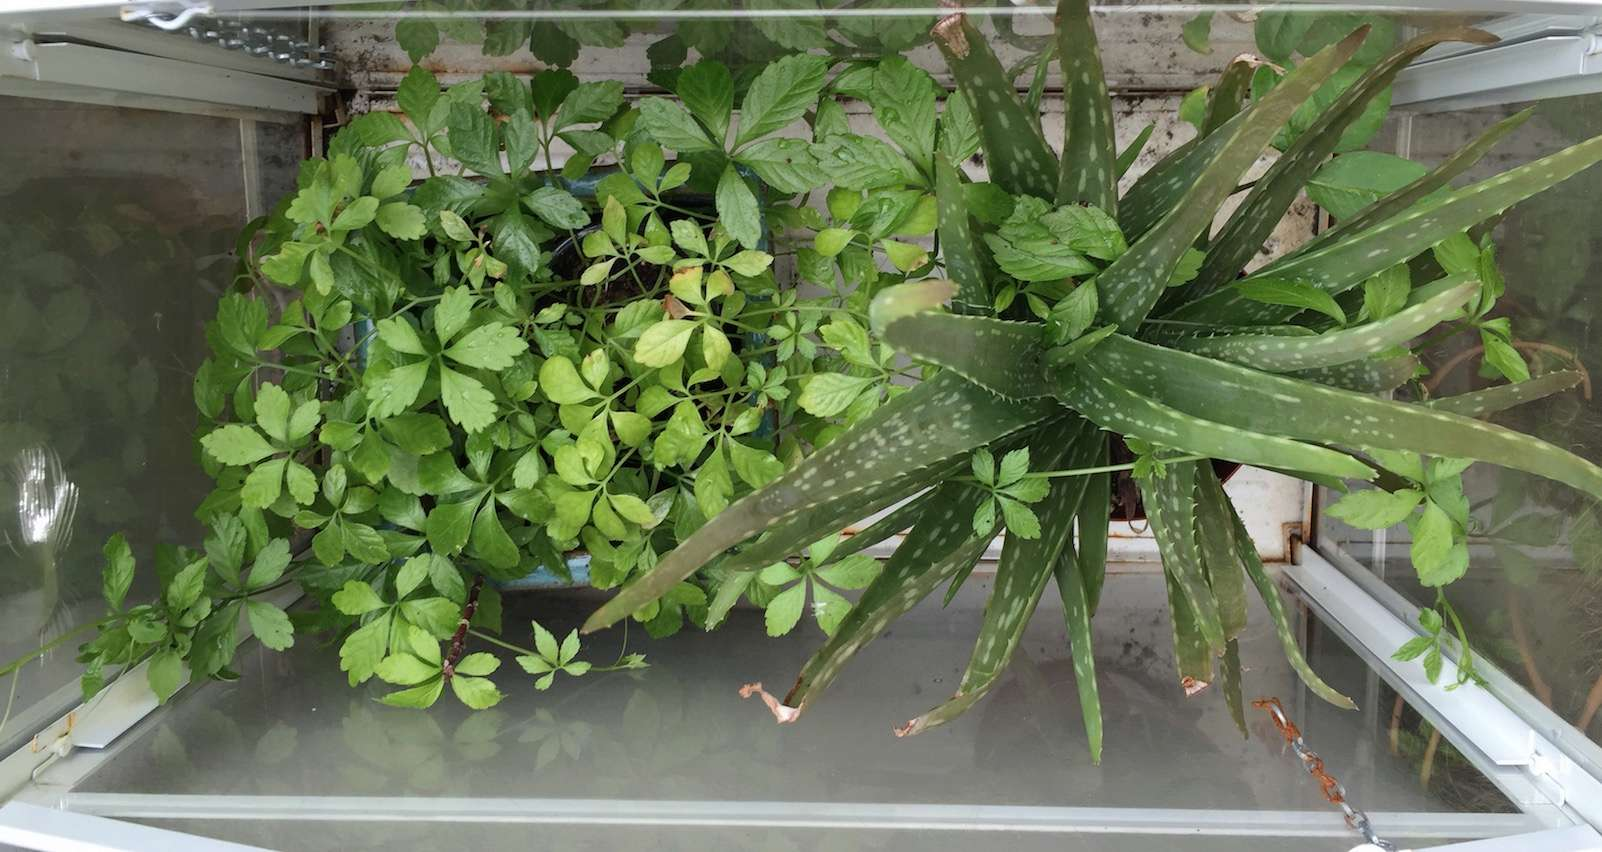 Jiaogulan [Gynostemma pentaphyllum] infos et guide de culture bouturage marcottage Captur11